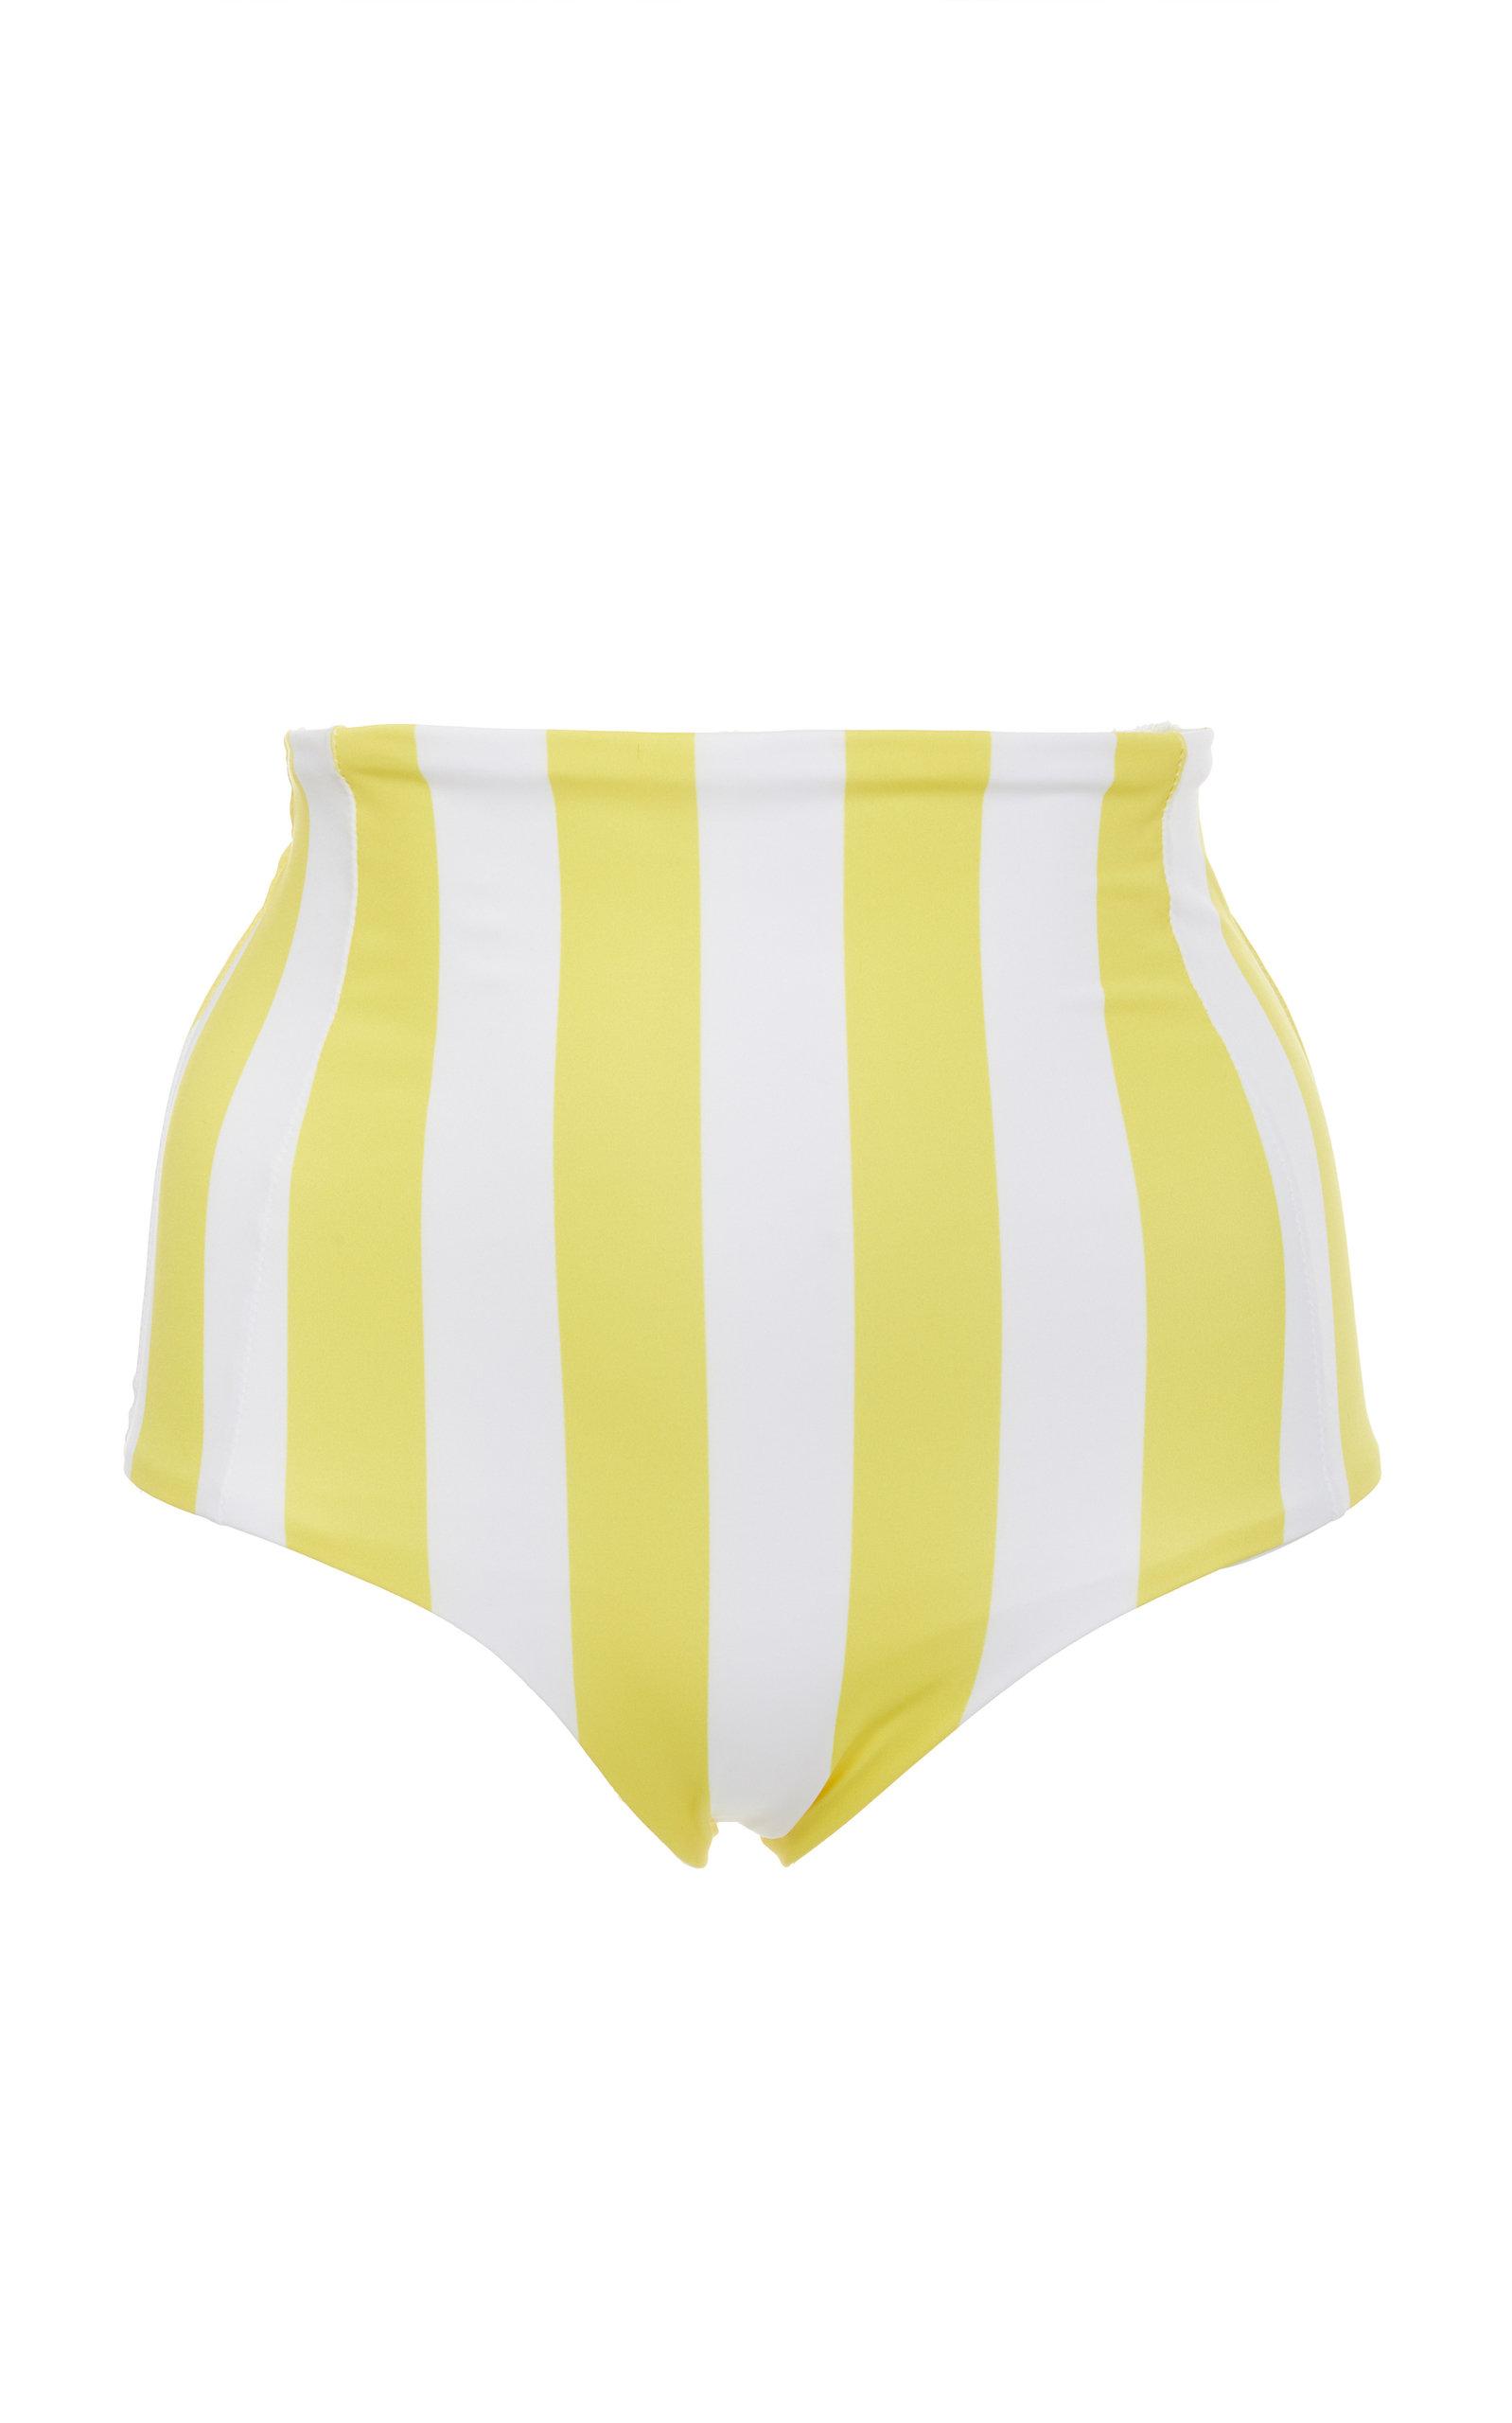 VERDE LIMON Banes High Waisted Bikini Bottoms in Yellow